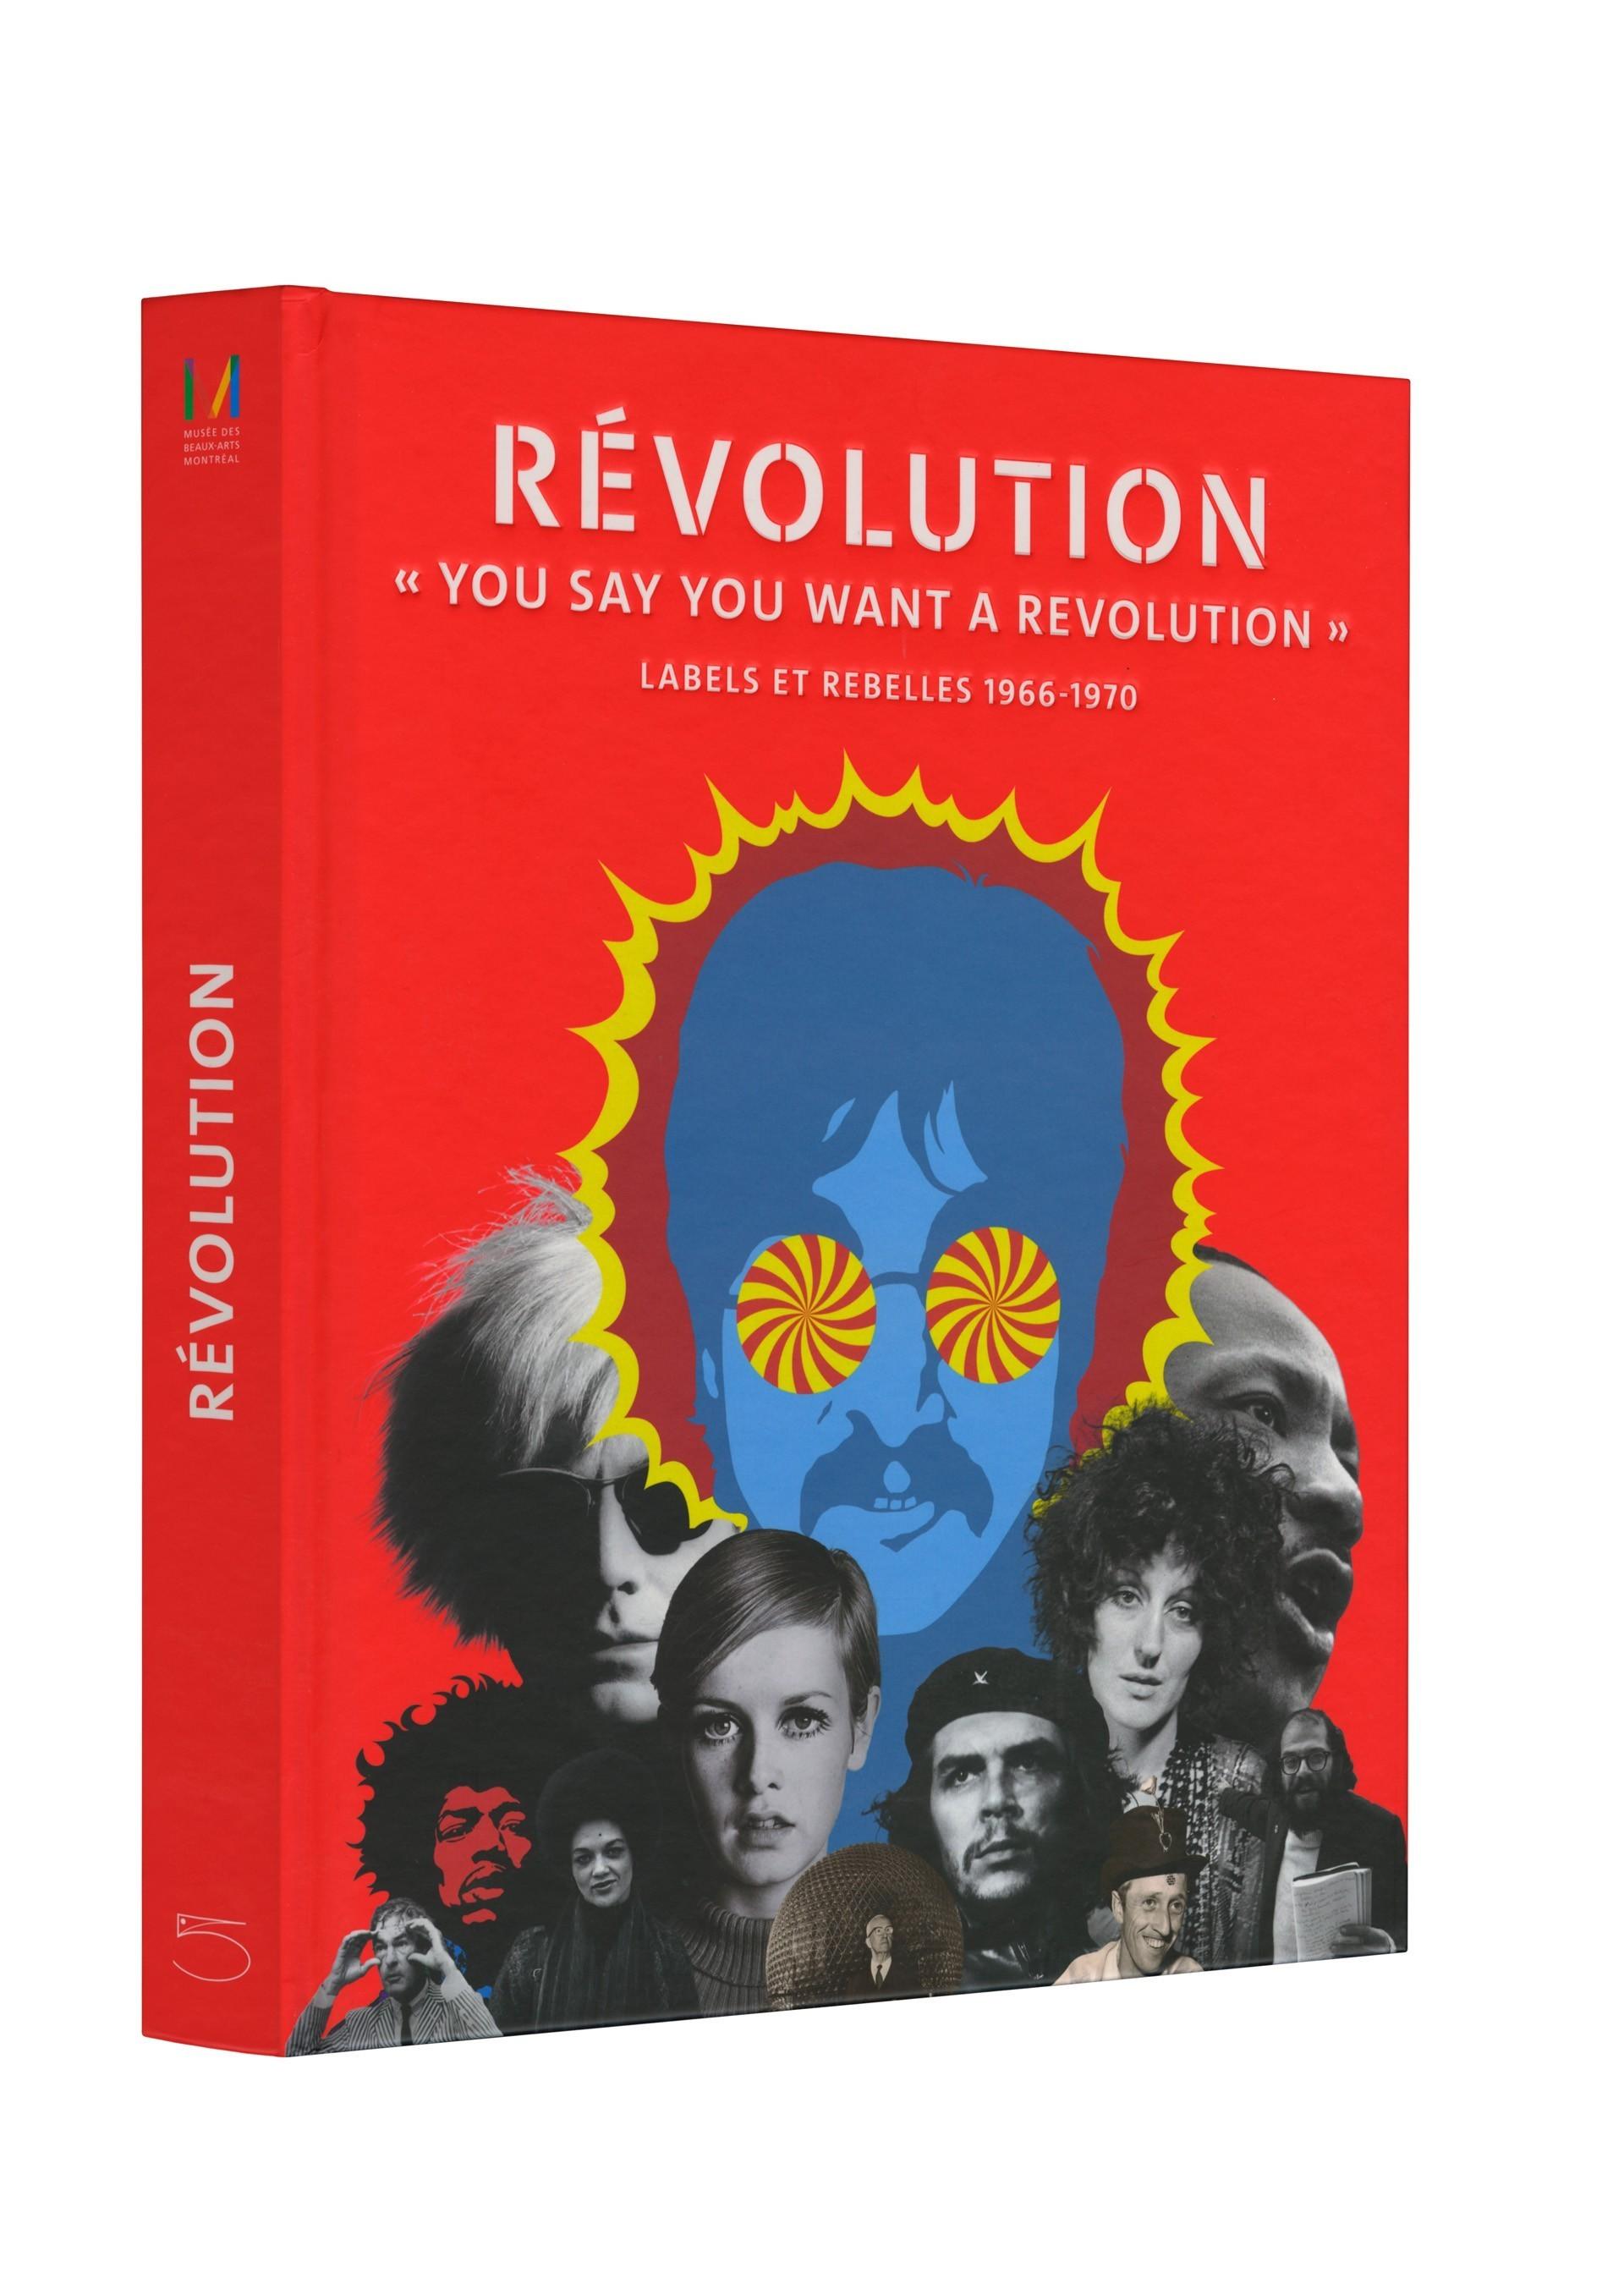 Révolution. You Say You Want a Revolution